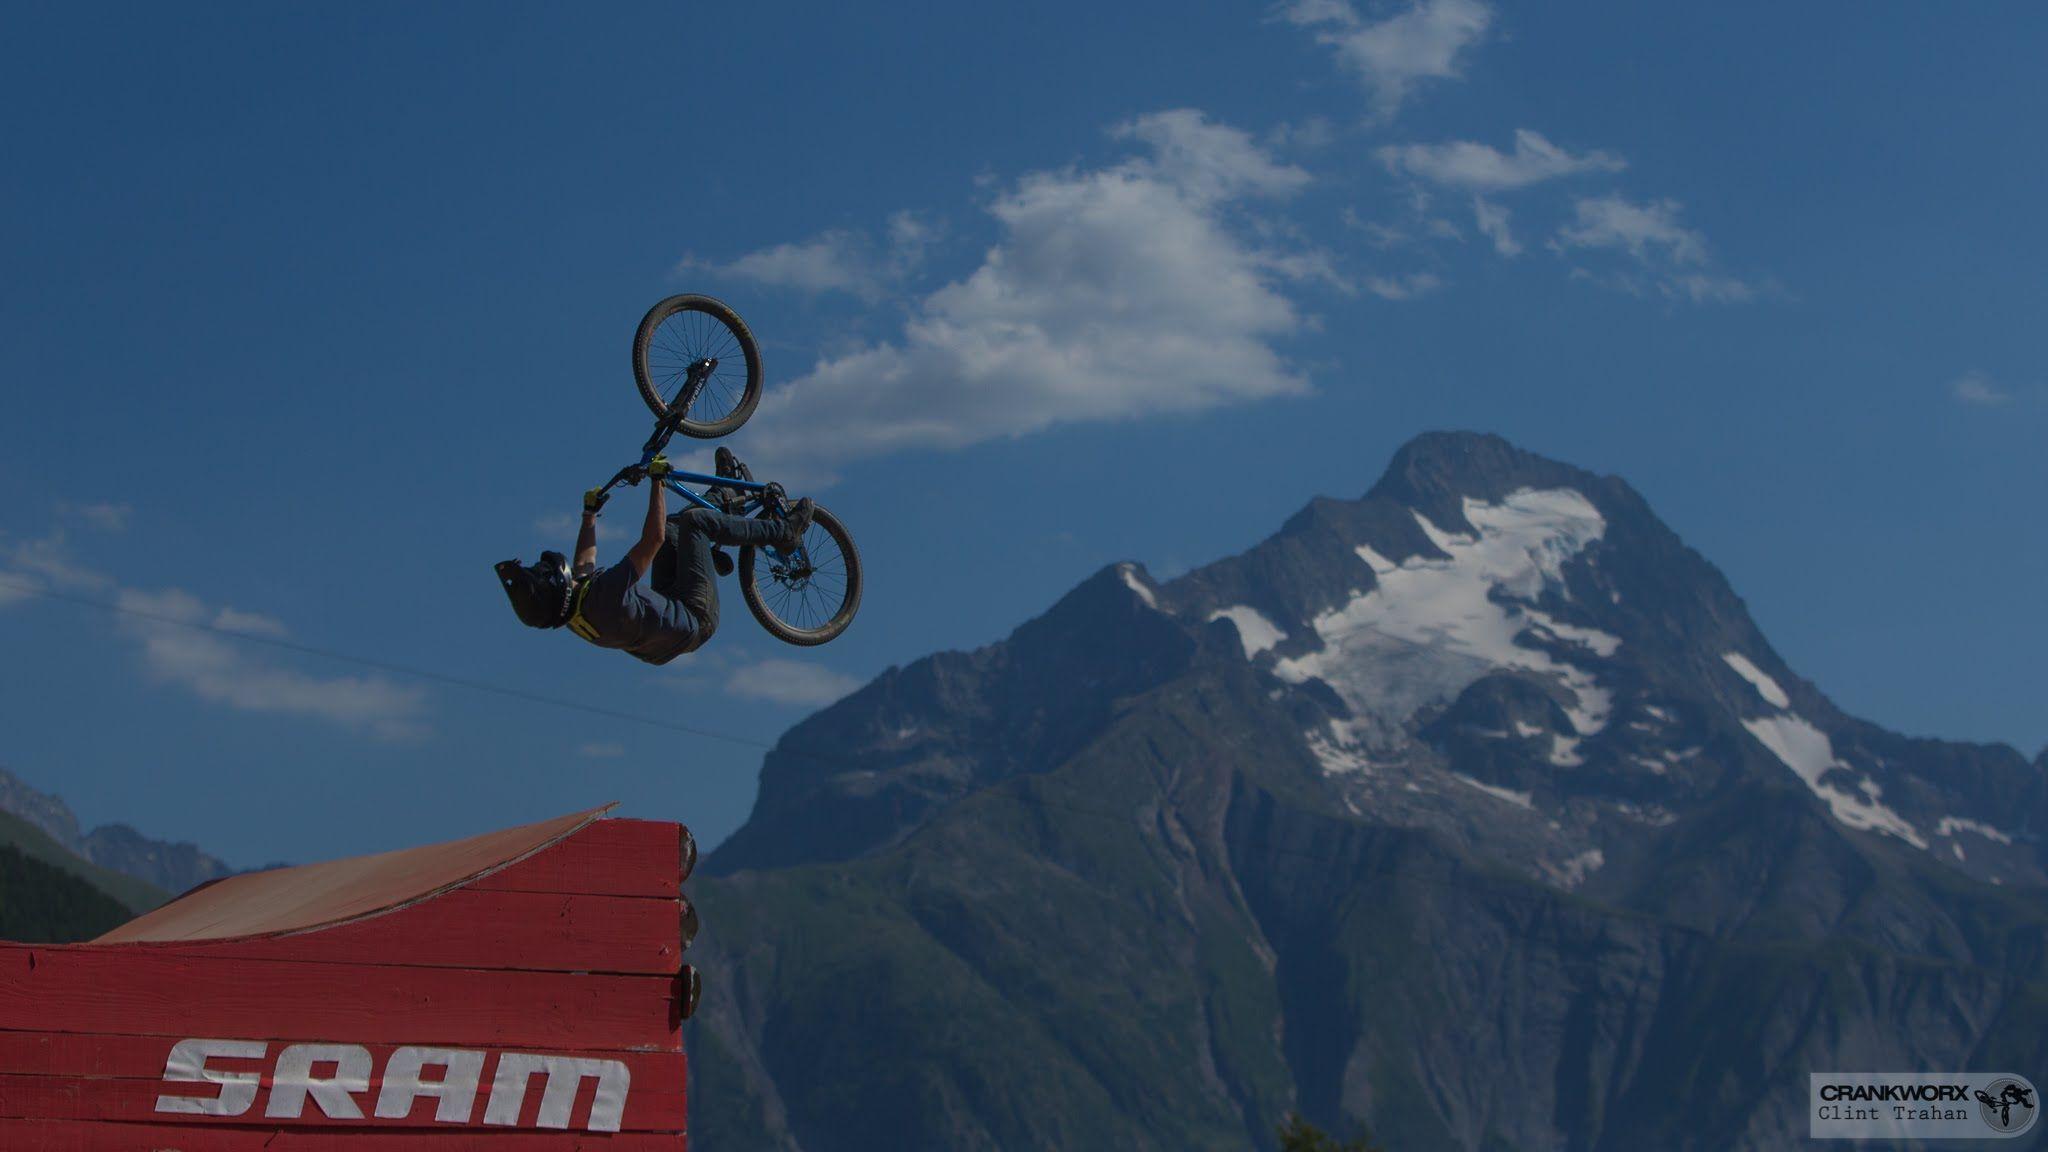 Crankworx Les 2 Alpes Slopestyle 2015